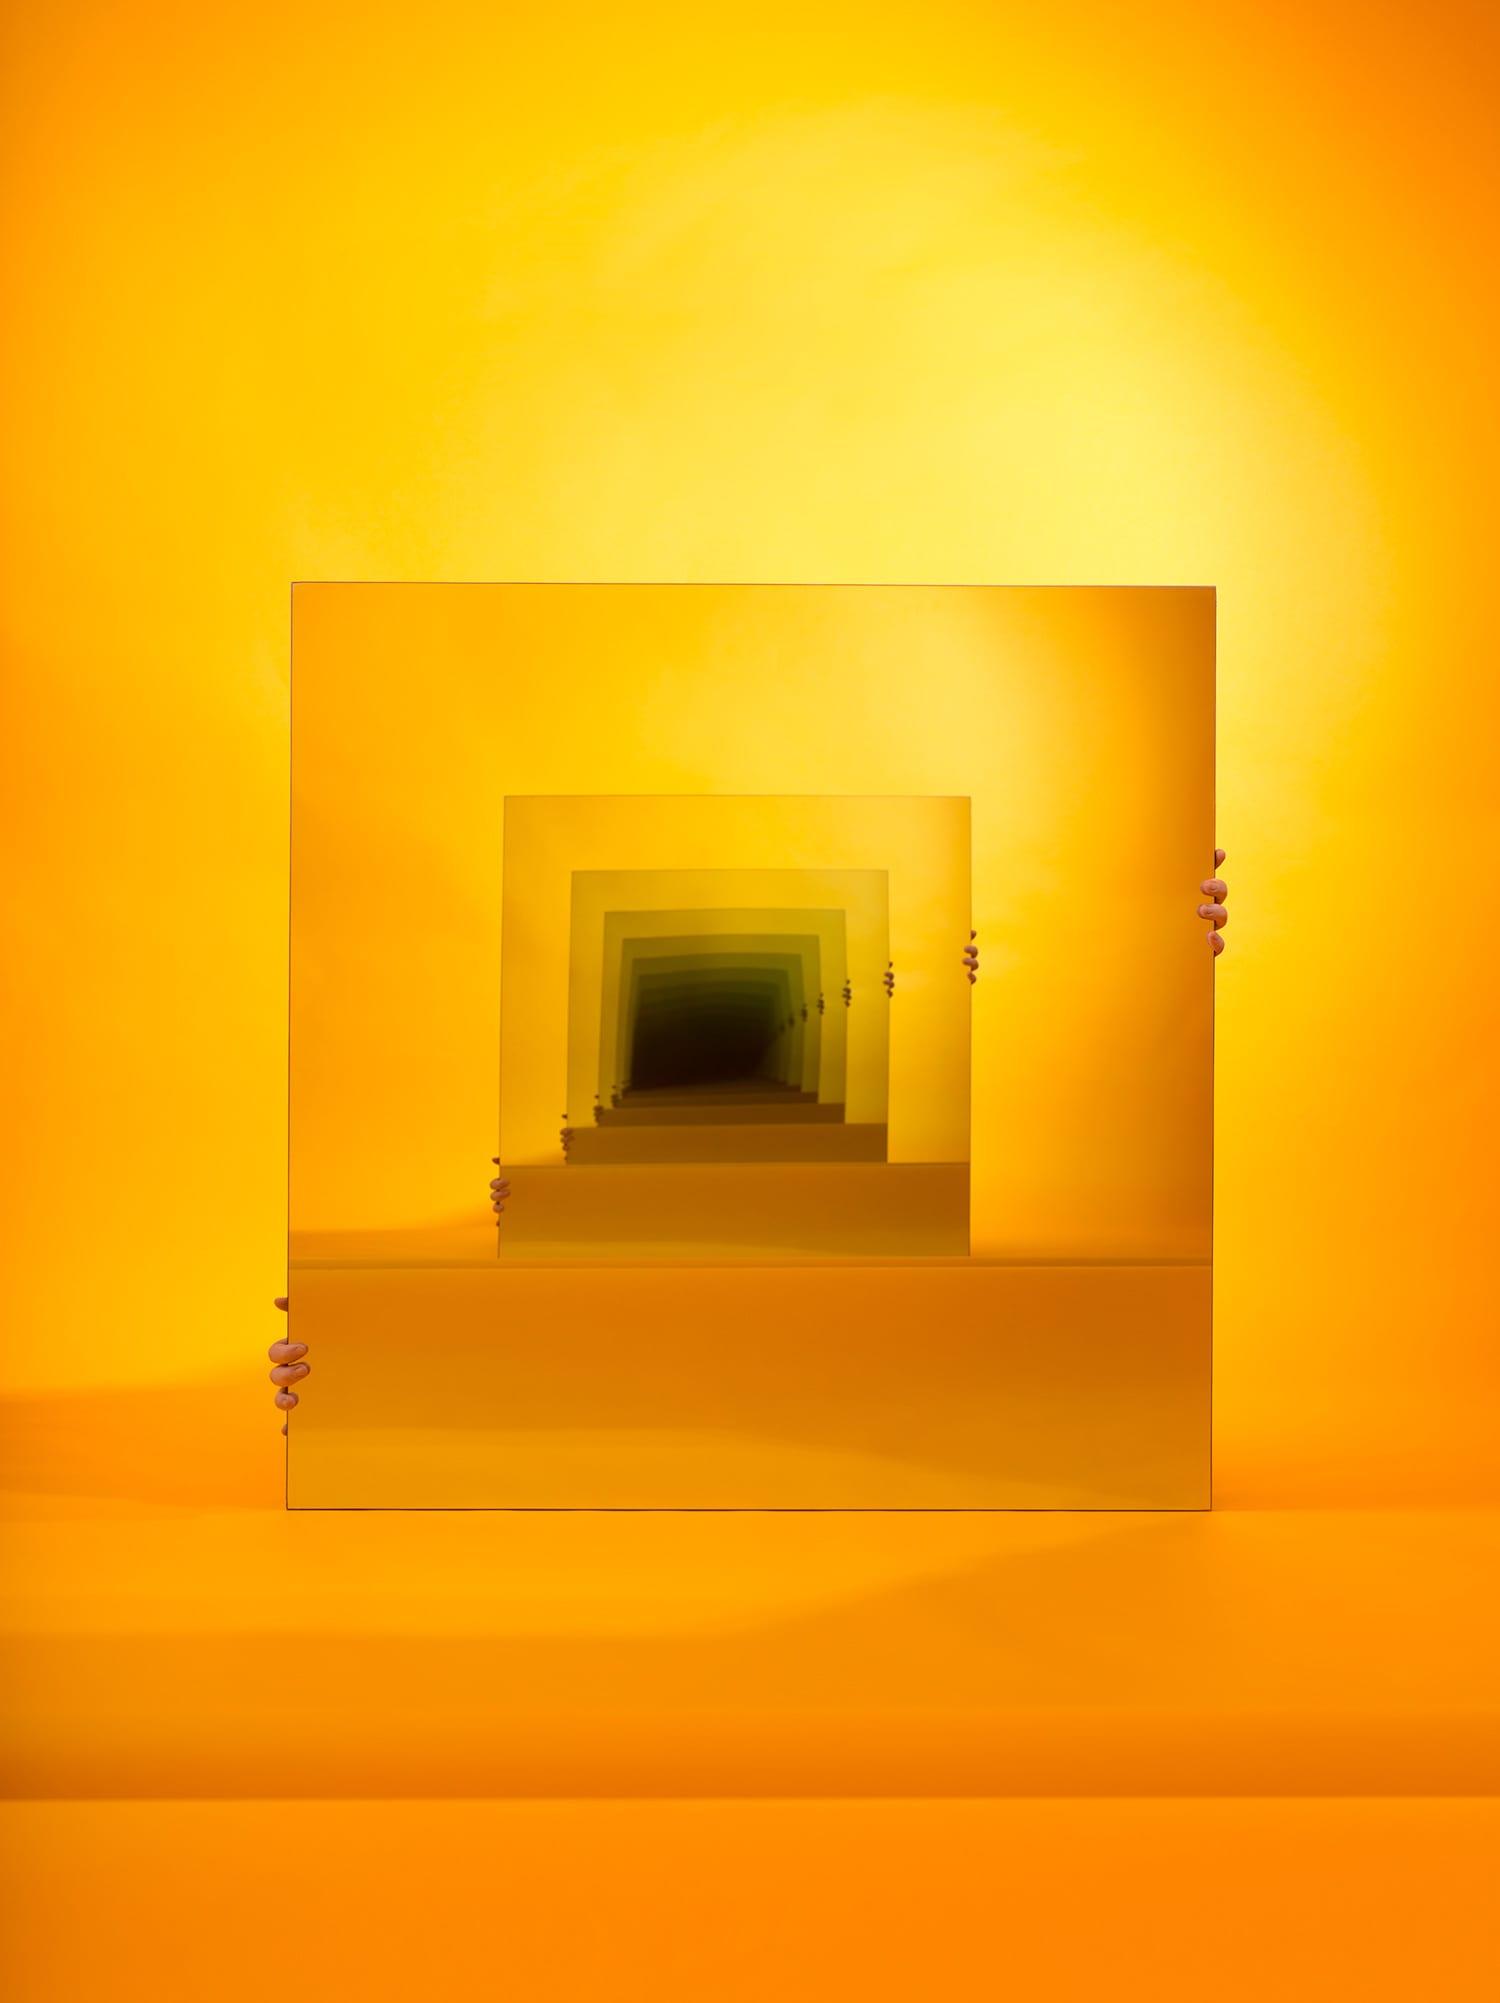 Yellowtrace Spotlight Australian Design News March 2014: Infinite Mirrored Tunnel Installations By Sarah Meyohas